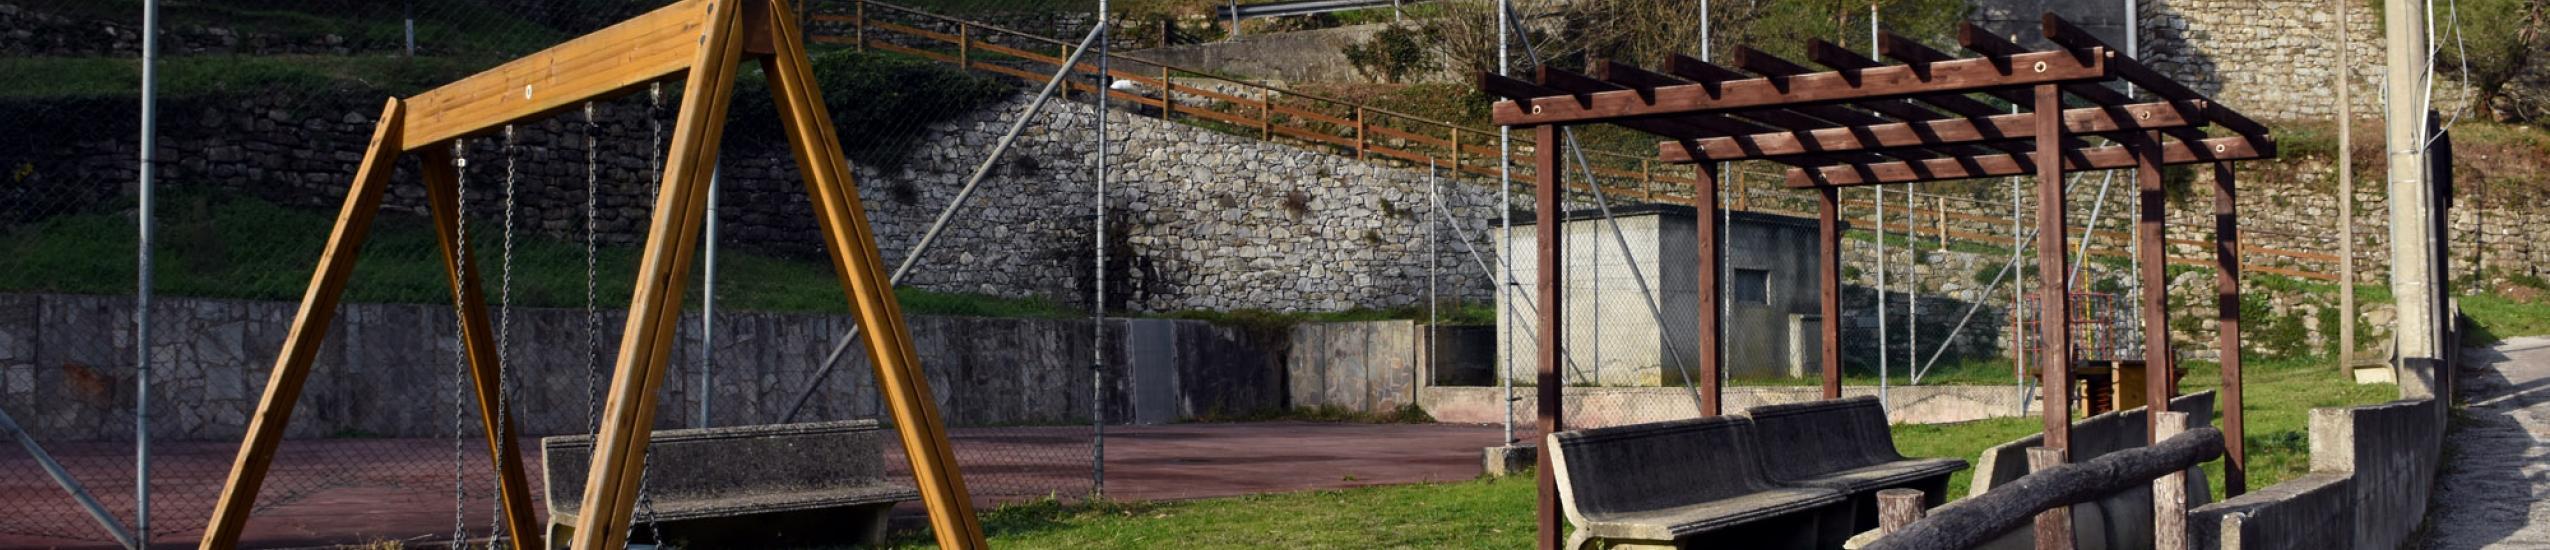 Ecoparco Chiesanuova (0)